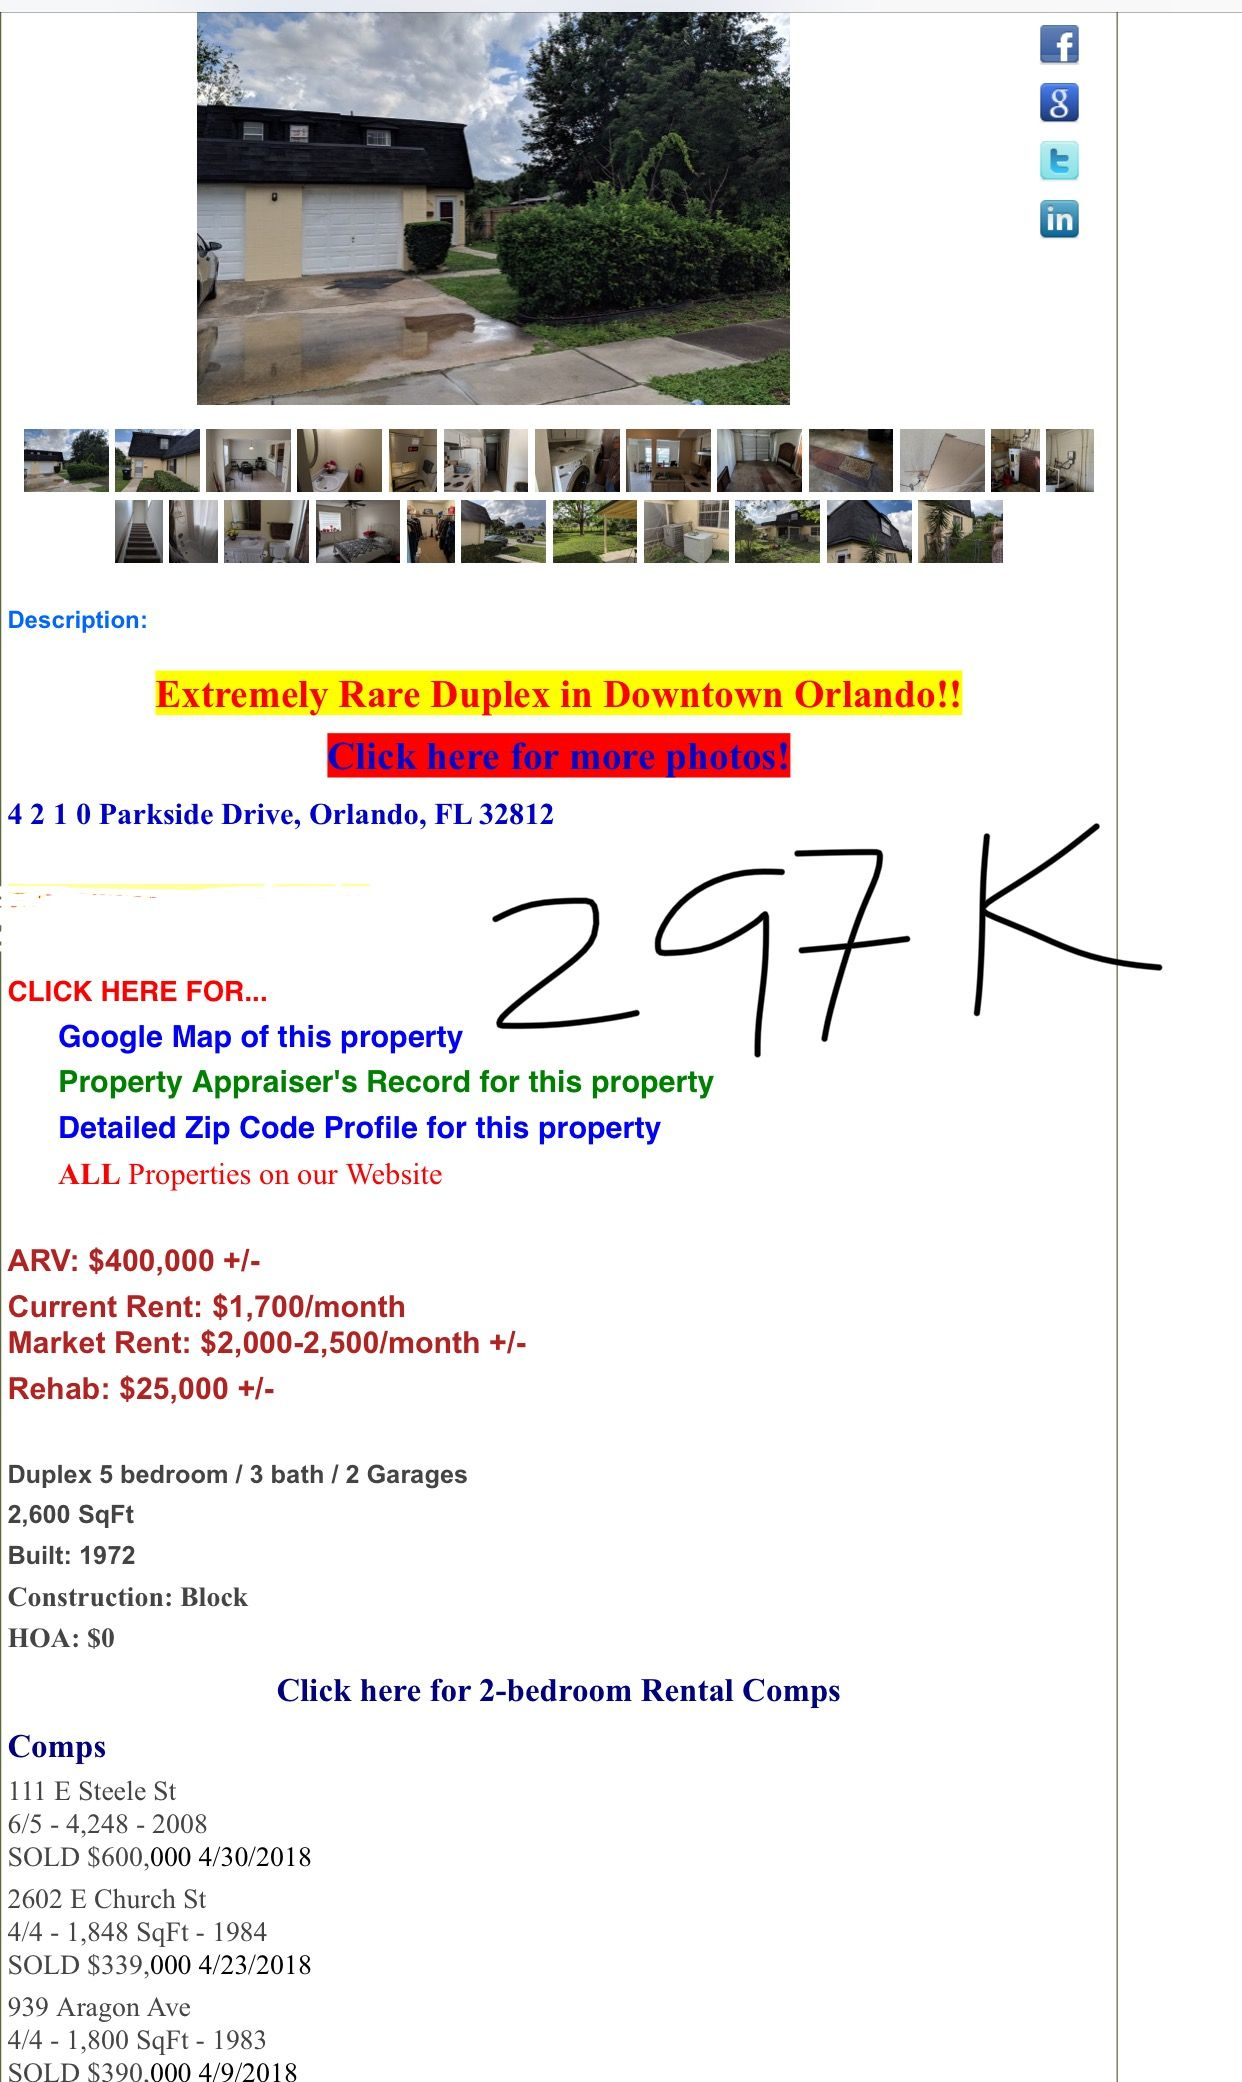 Duplex close to Downtown Orlando $297k, ARV $400k, 512-277-4461 or on map of zip code 32836, map of zip code 32807, map of zip code 32818, map of zip code 32837, map of zip code 32824, map of zip code 32827, map of zip code 32832, map of zip code 32806,